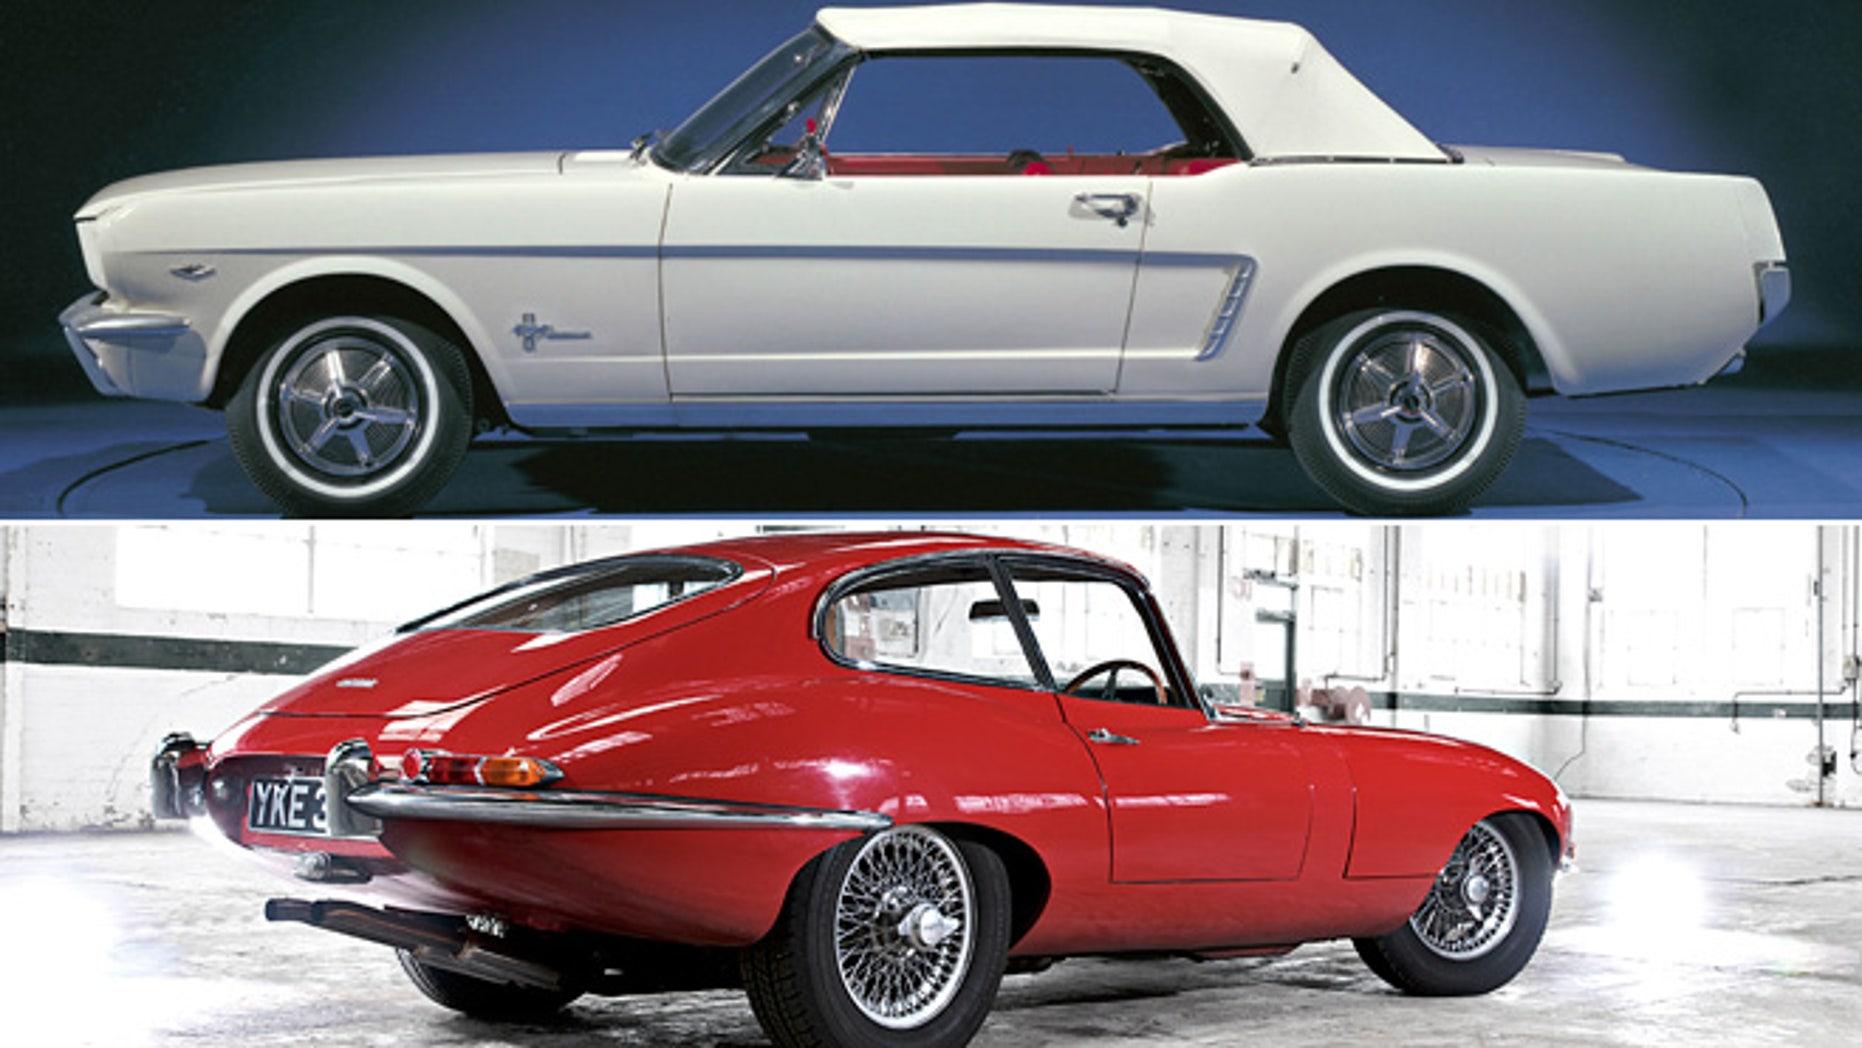 Ford Mustang/Jaguar E-Type